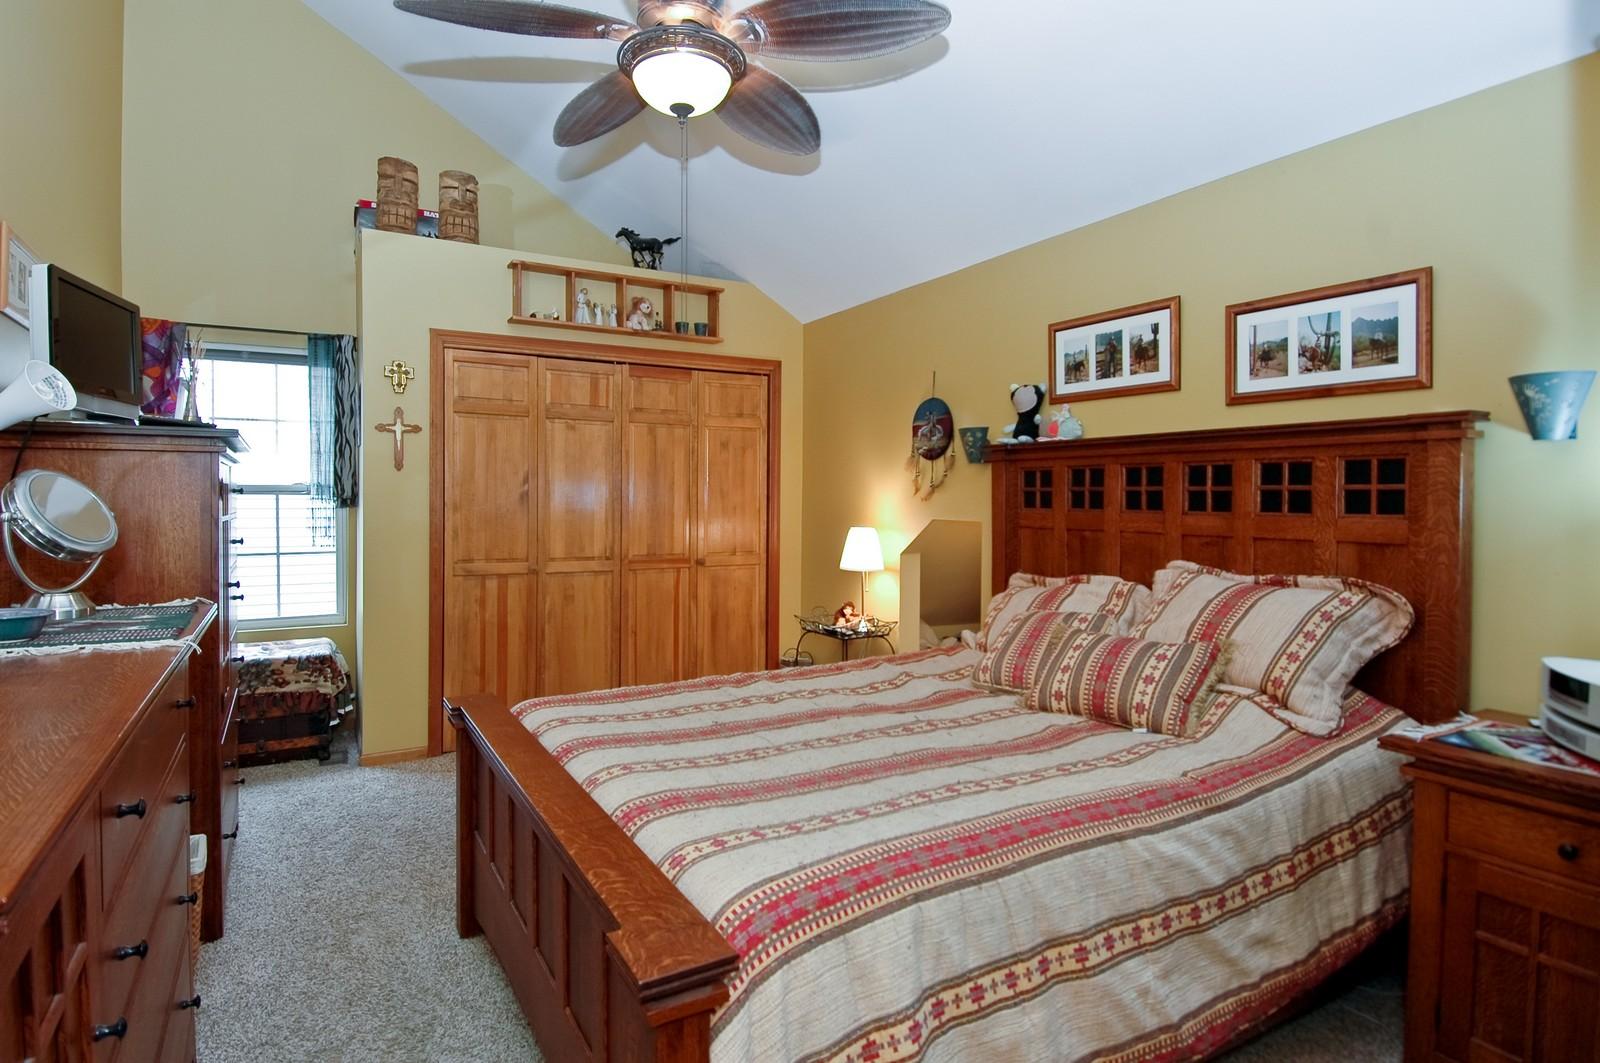 Real Estate Photography - 10315 Wilmette, Algonquin, IL, 60102 - Master Bedroom